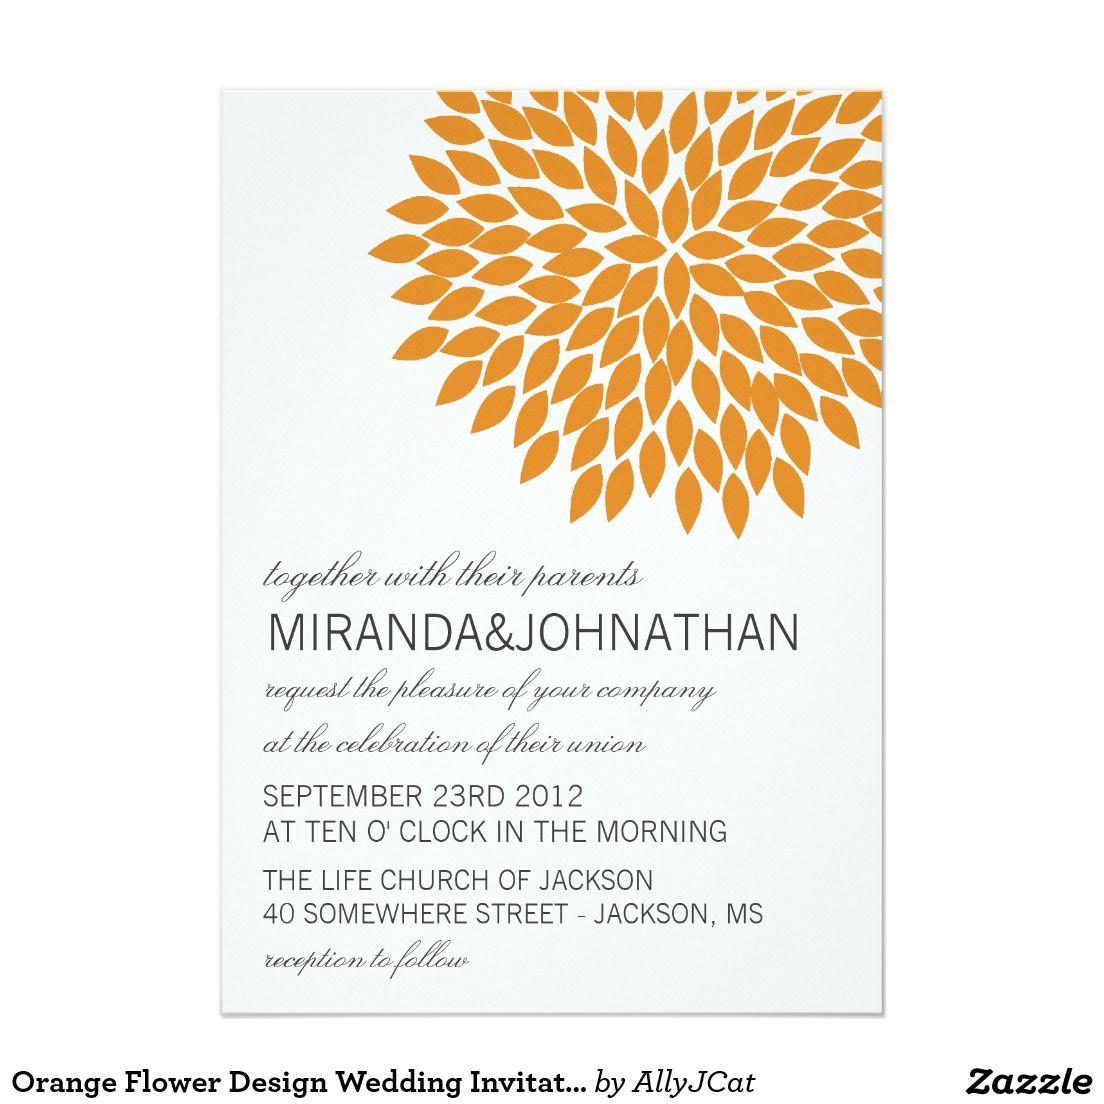 Orange flower design wedding invitations 5 x 7 invitation card orange flower design wedding invitations stopboris Choice Image